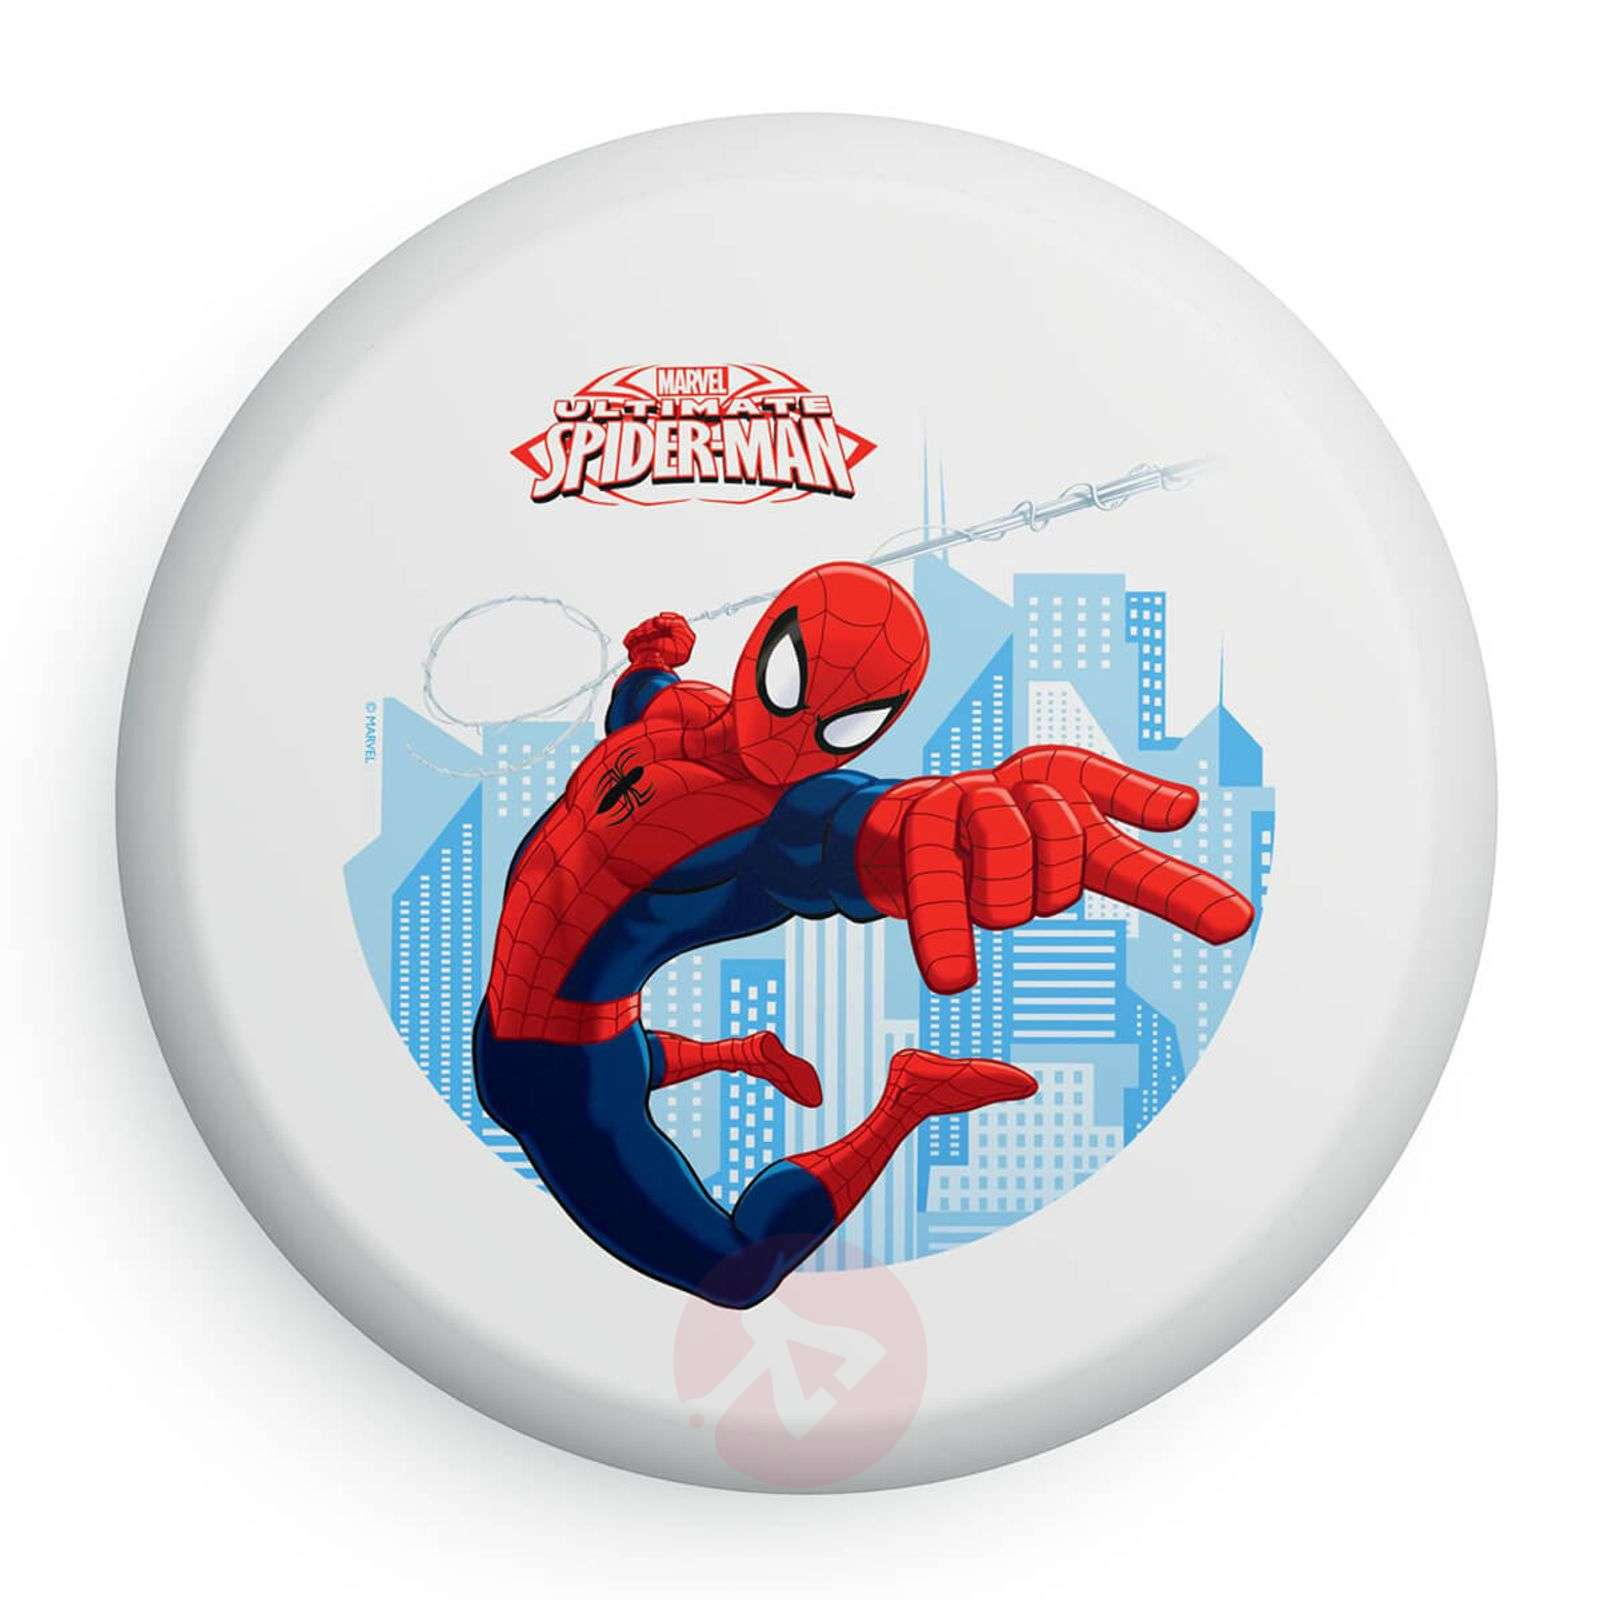 ... LED Ceiling Lamp Spiderman 7534021 02 ...